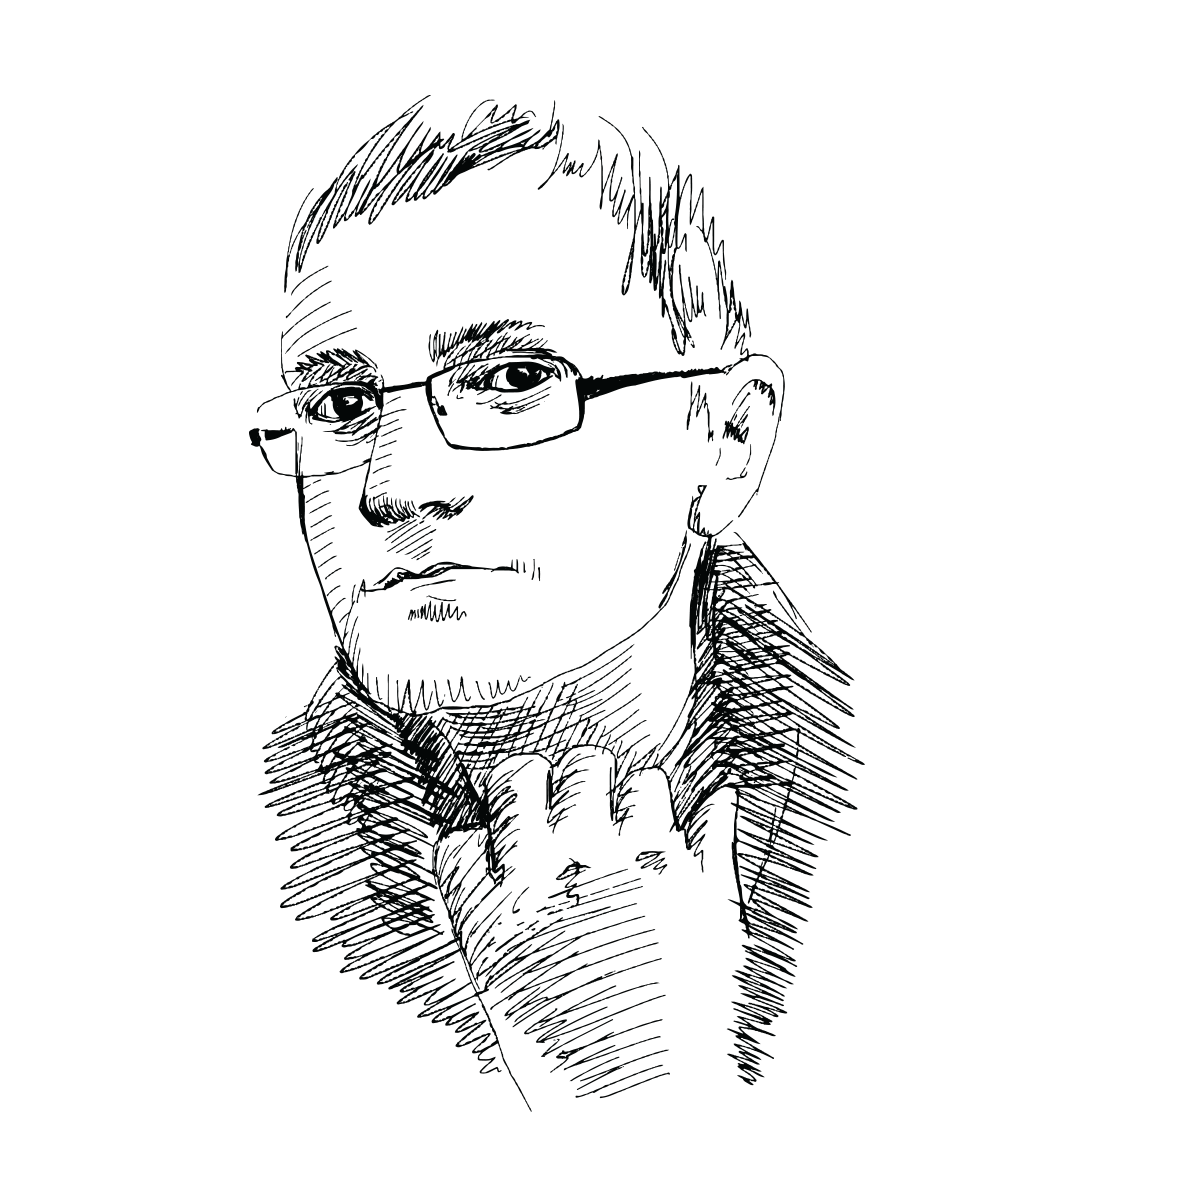 https://www.stijlinkleur.nl/wp-content/uploads/2017/05/minimalist-image-team-member-03-large.png